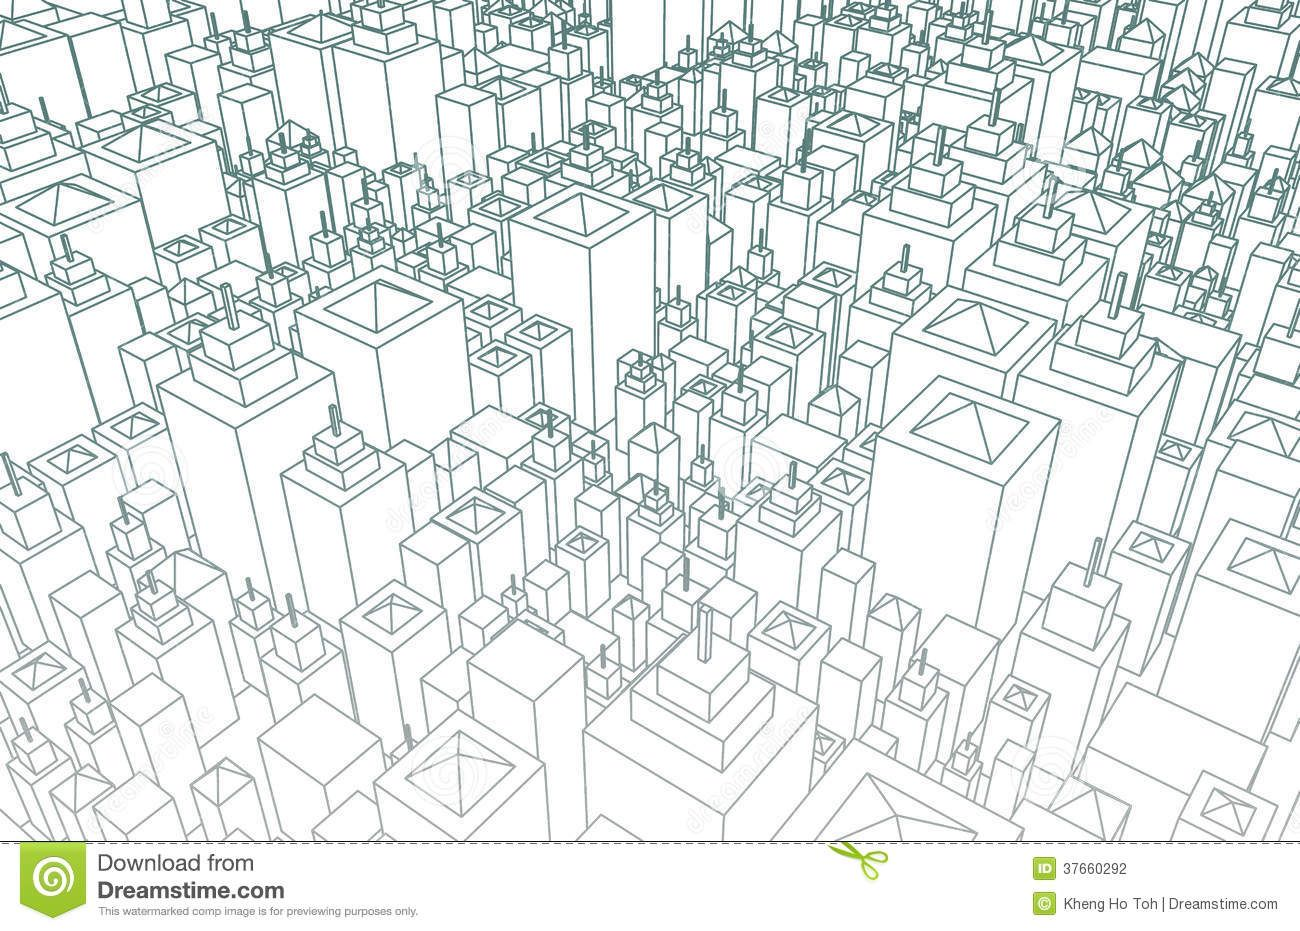 Wireframe city buildings blueprint design art 37660292g 1300931 wireframe city buildings blueprint design art 37660292g 1300931 malvernweather Gallery